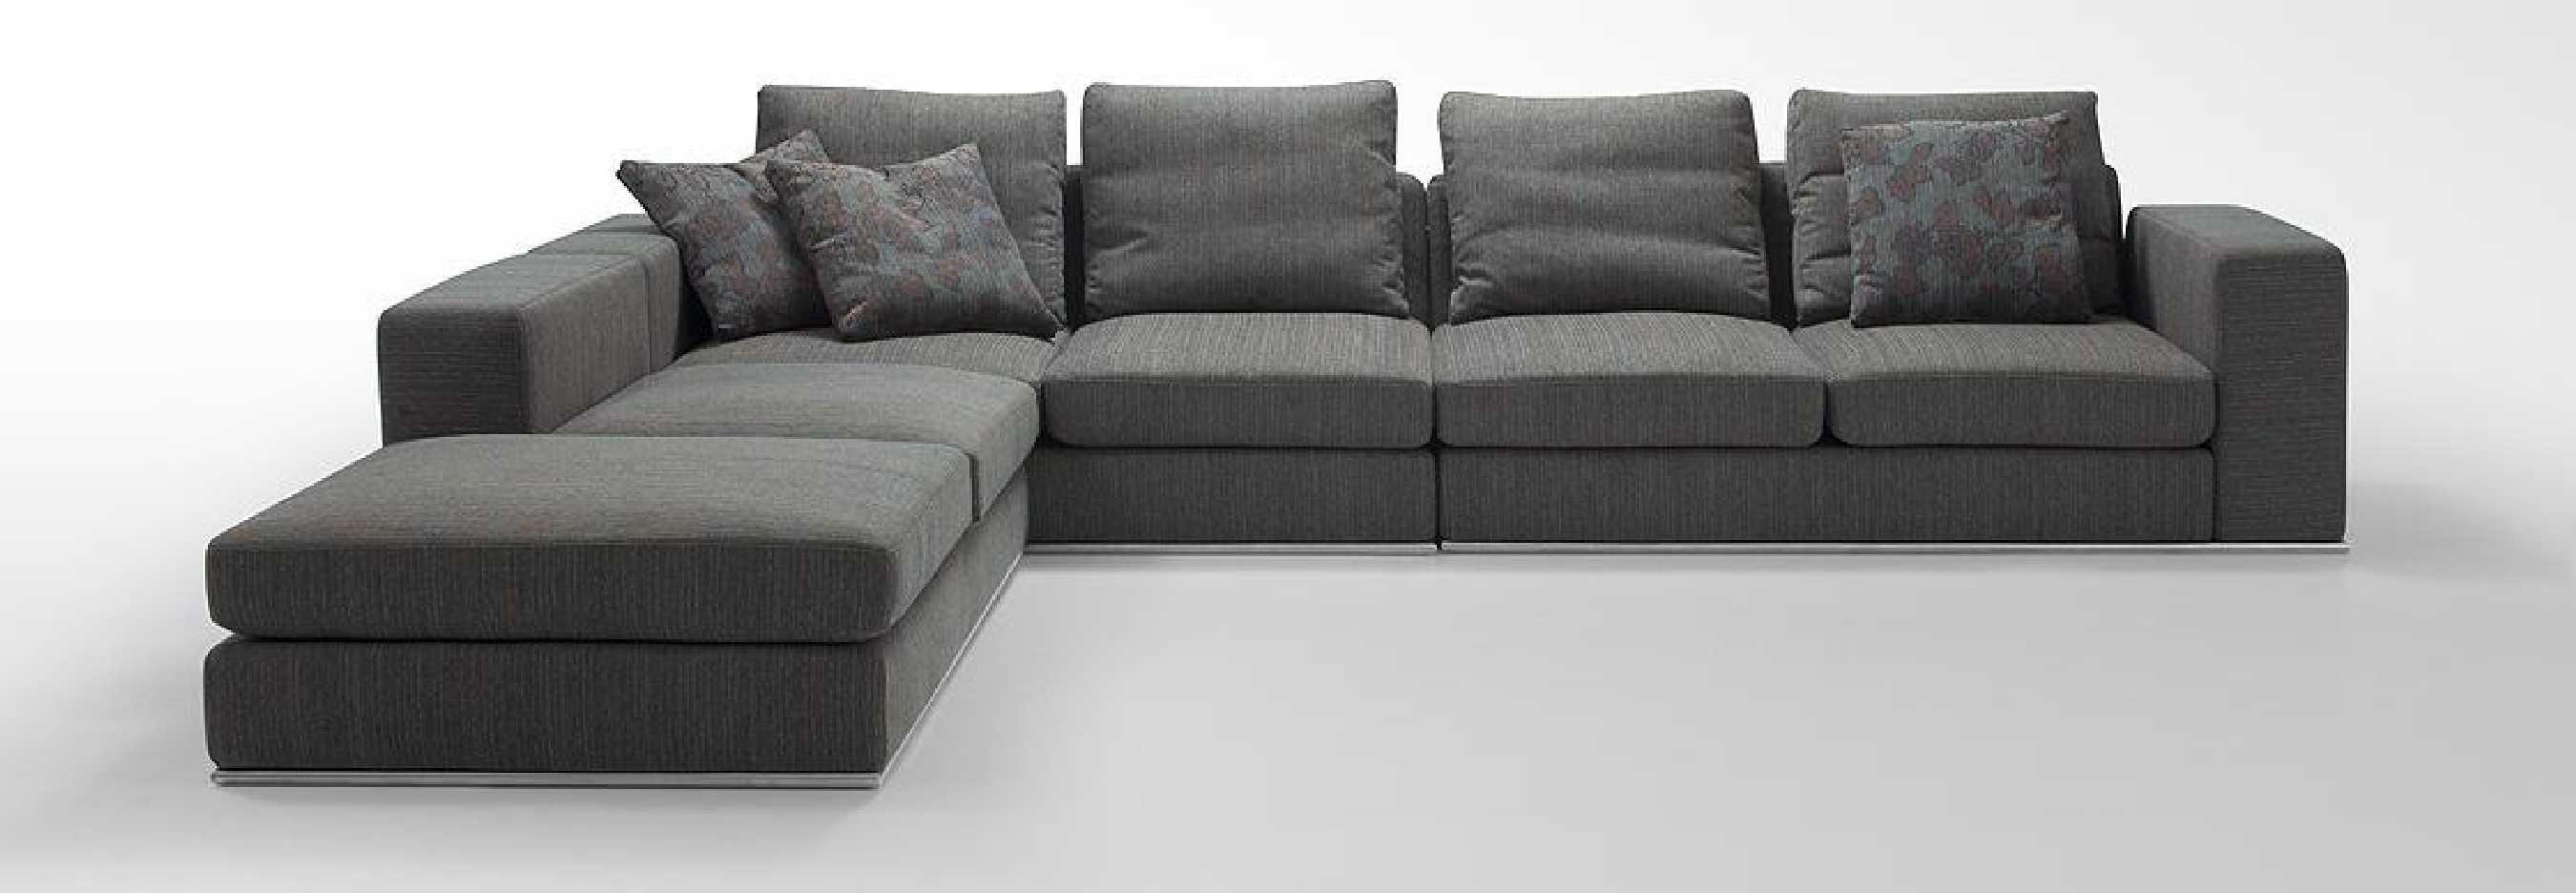 Sofas Center : Astounding Greyectionalofas Photos Design Gray Inside Sofas With Chrome Legs (Image 16 of 20)